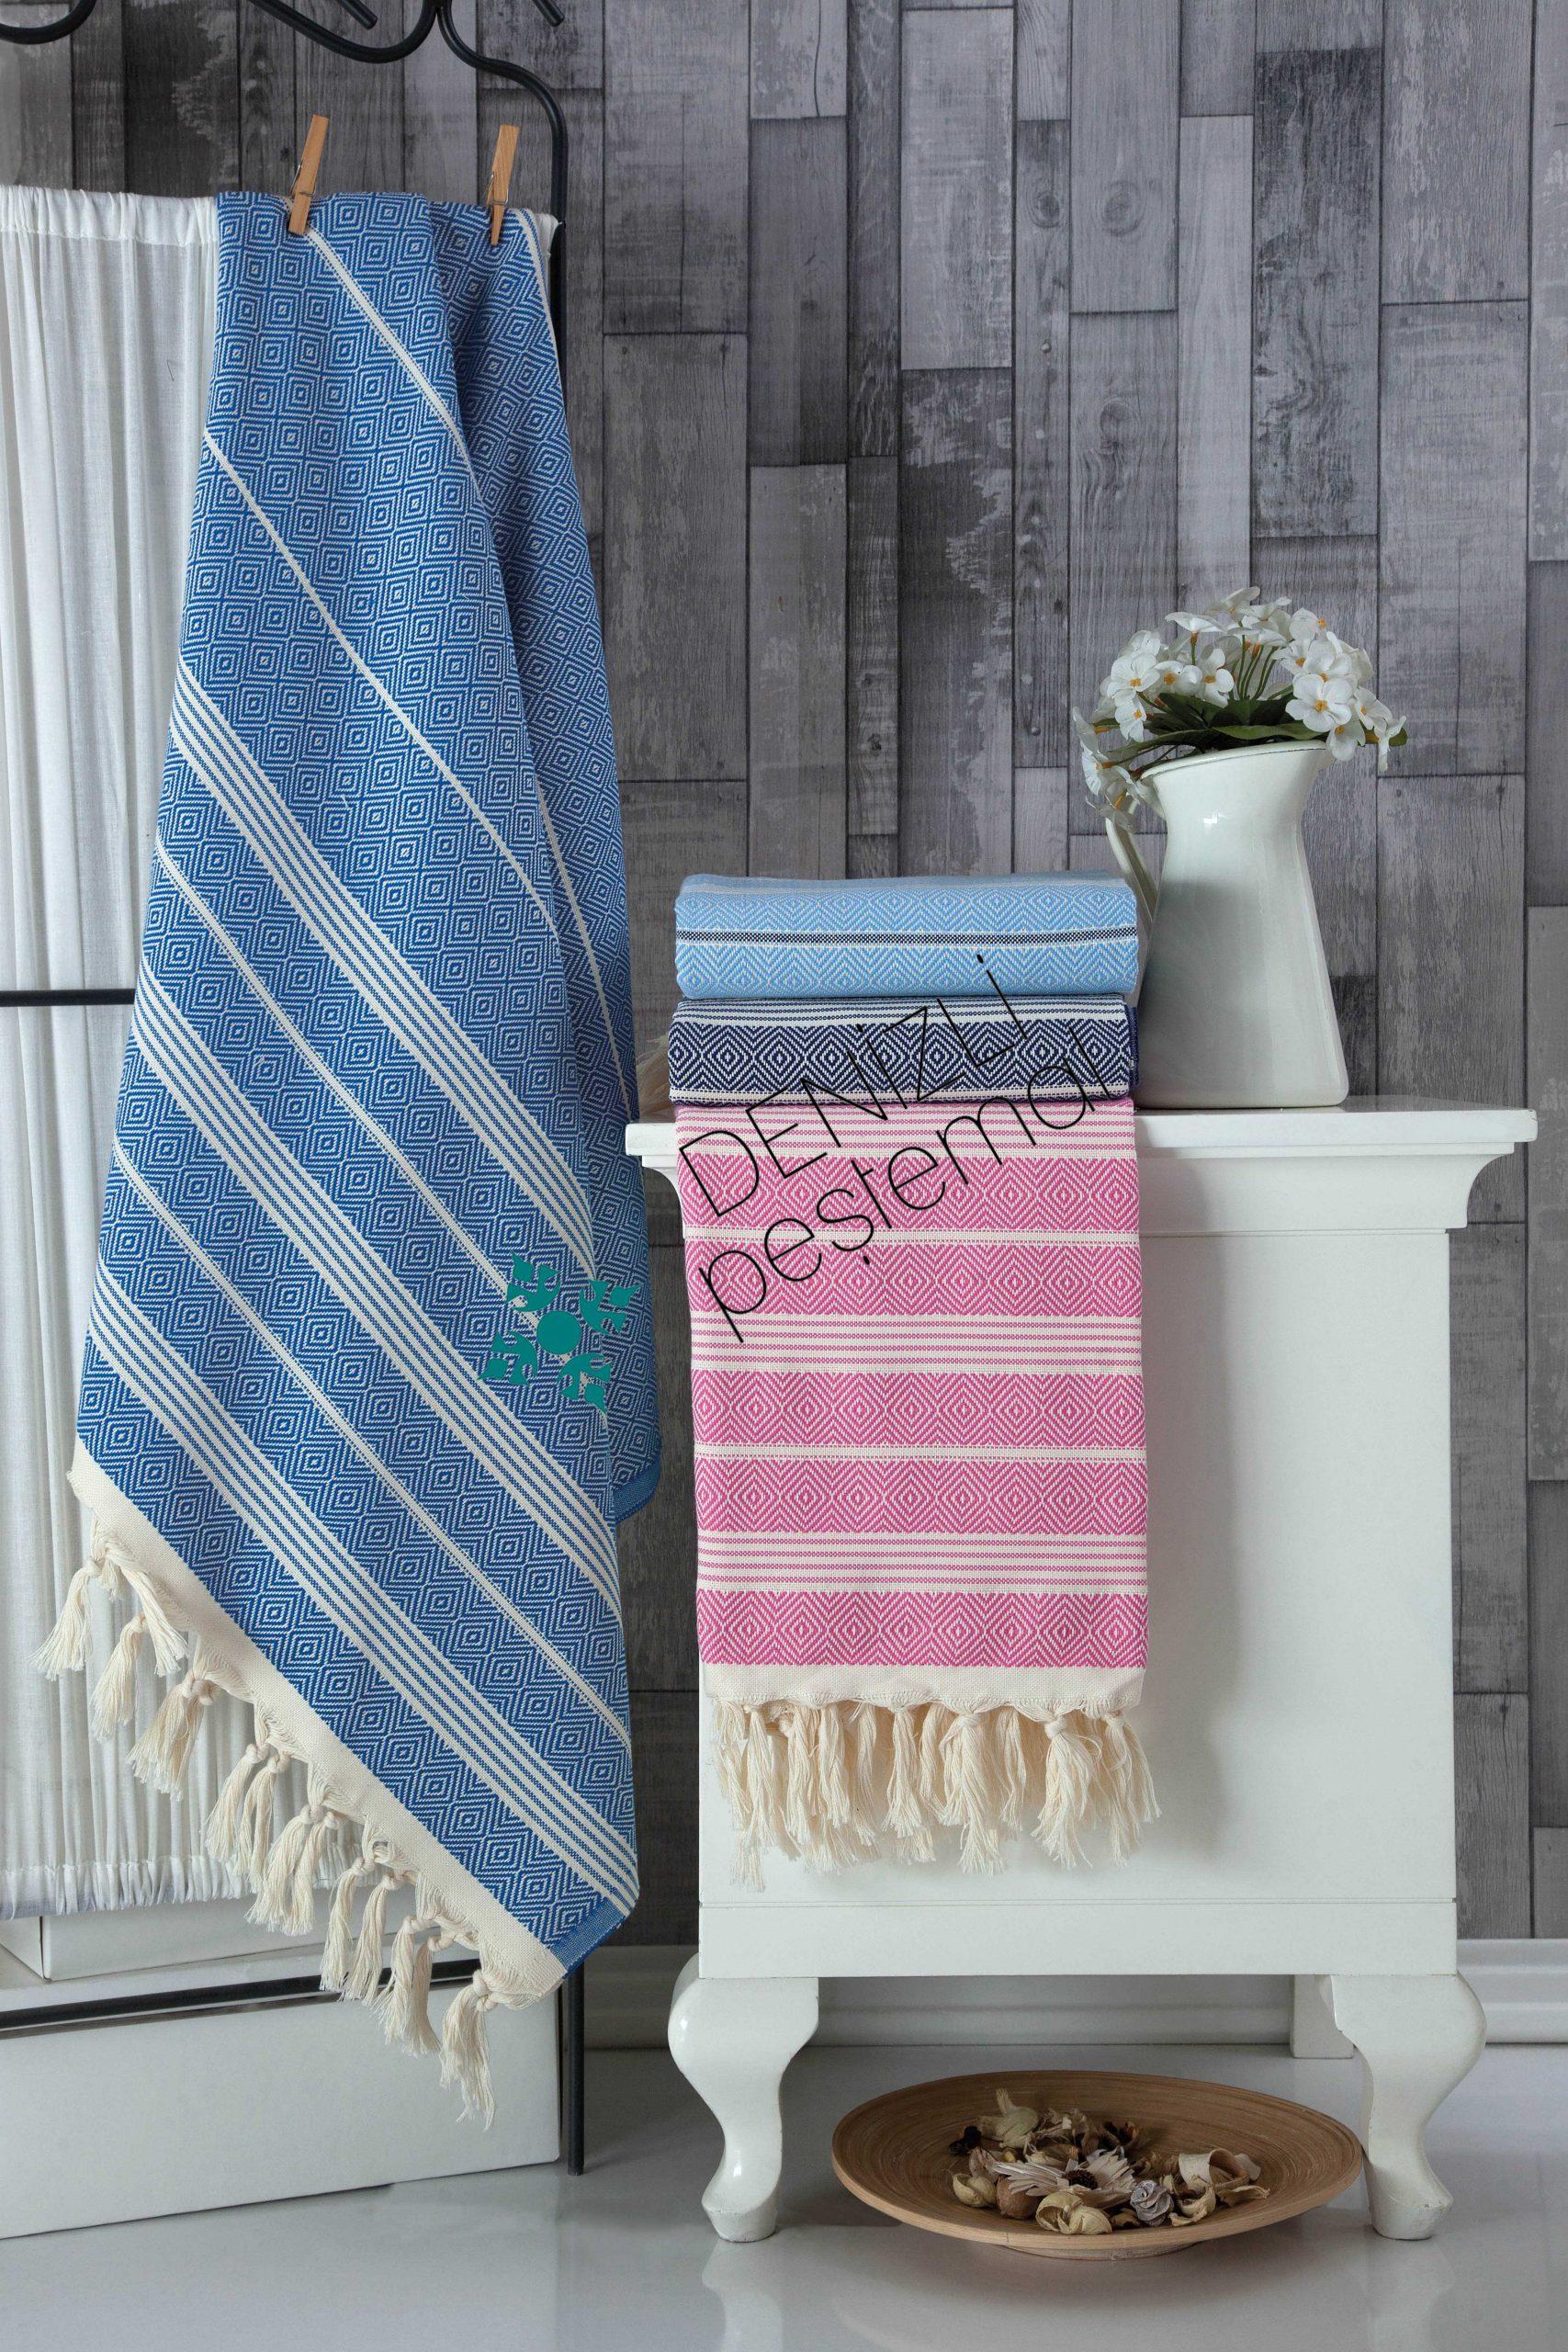 Turkish Wholesale Towel for Bathrobe